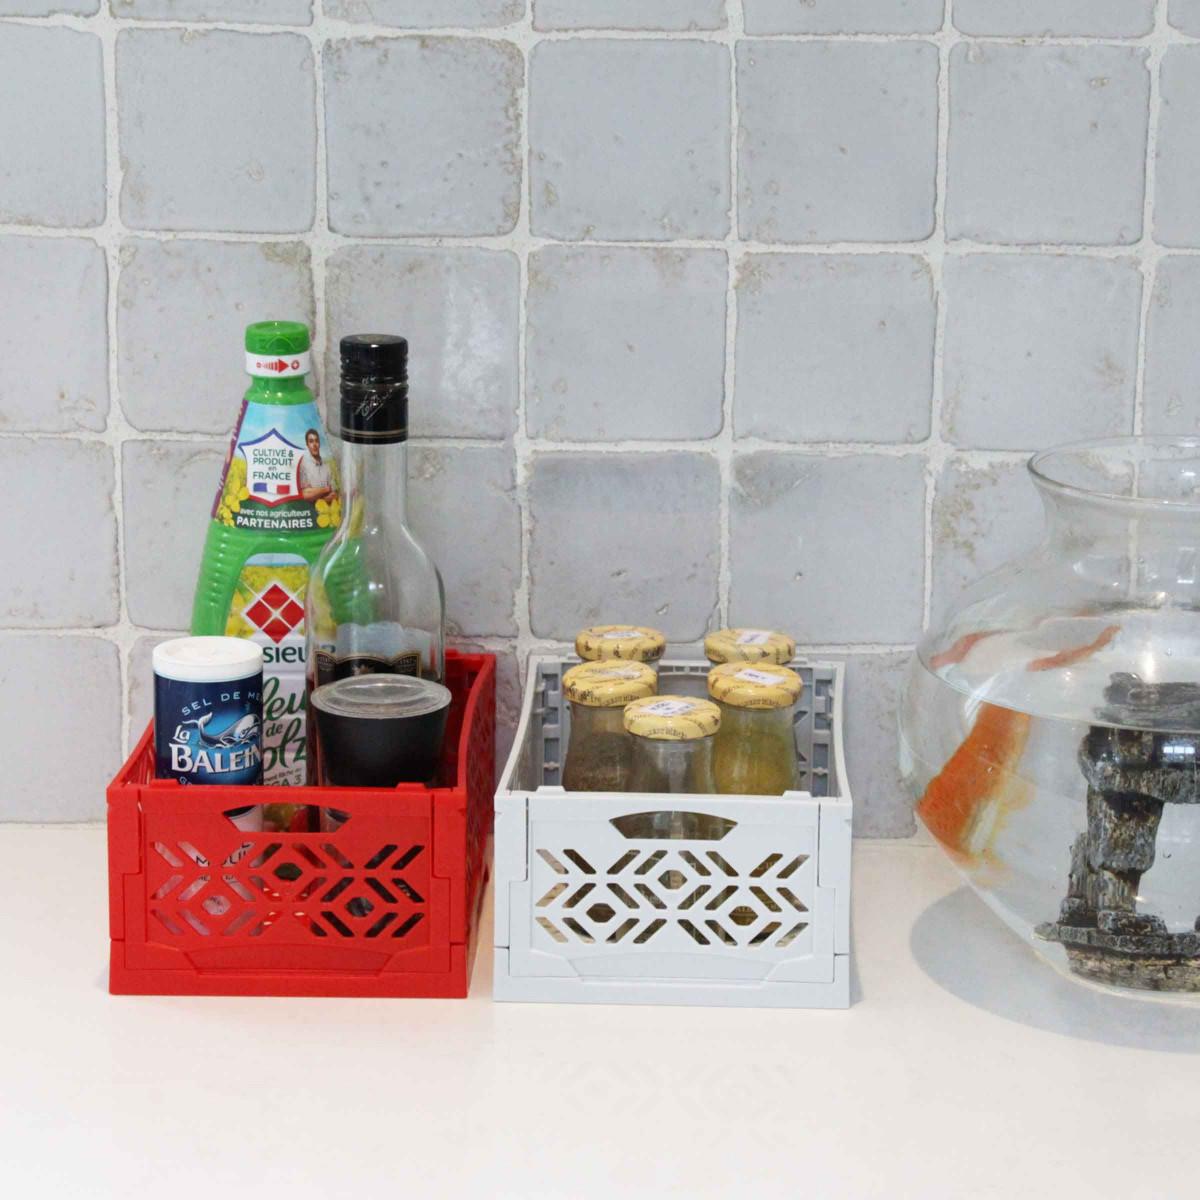 cagette empilable pliable rouge rangement fruits et l gumes. Black Bedroom Furniture Sets. Home Design Ideas